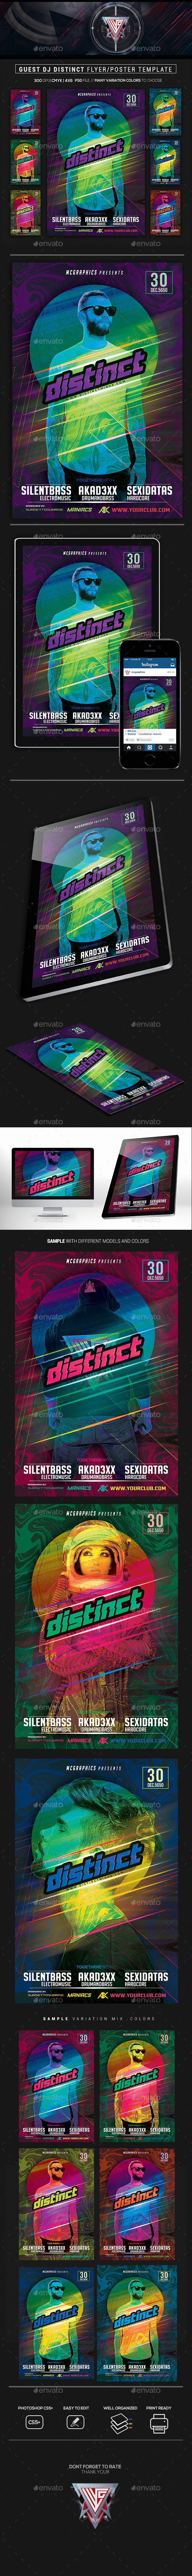 Guest DJ Distinct Flyer/Poster Template - Clubs & Parties Events